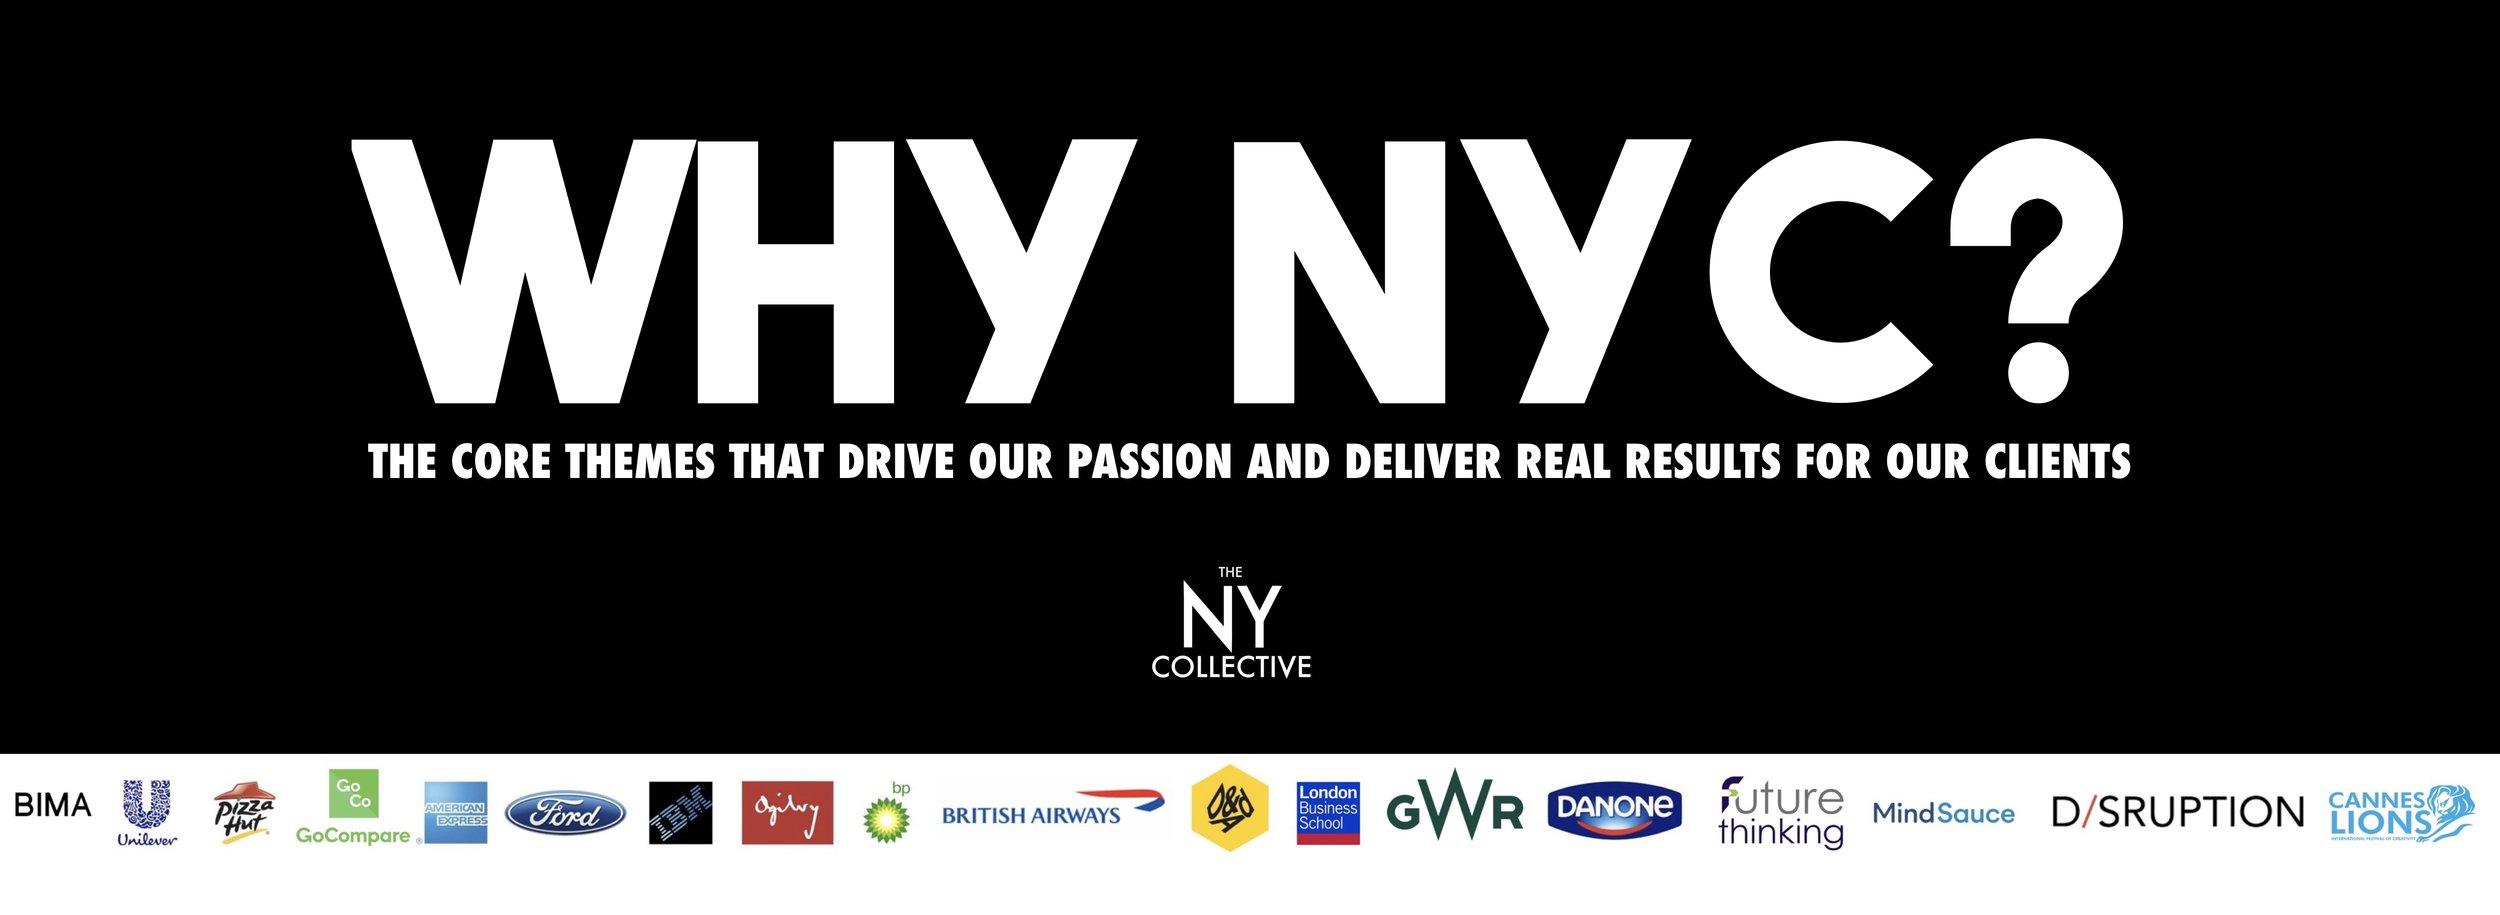 WHY NYC?.jpg